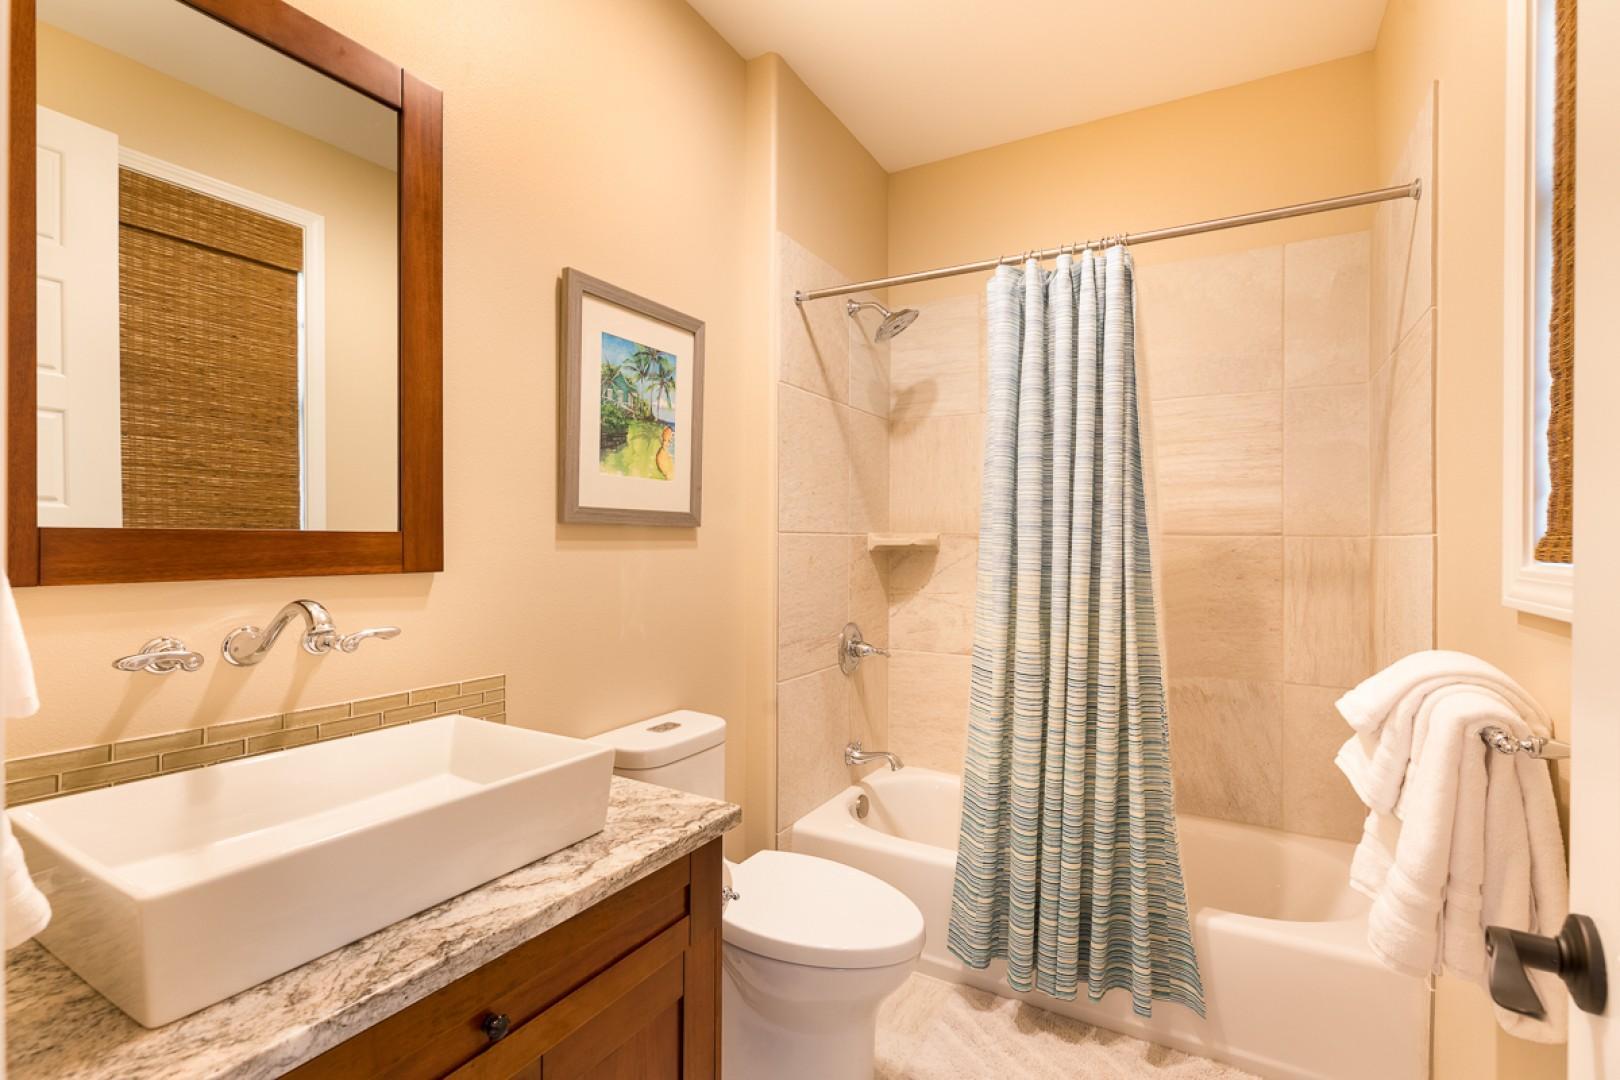 Bathroom three has a shower and a tub